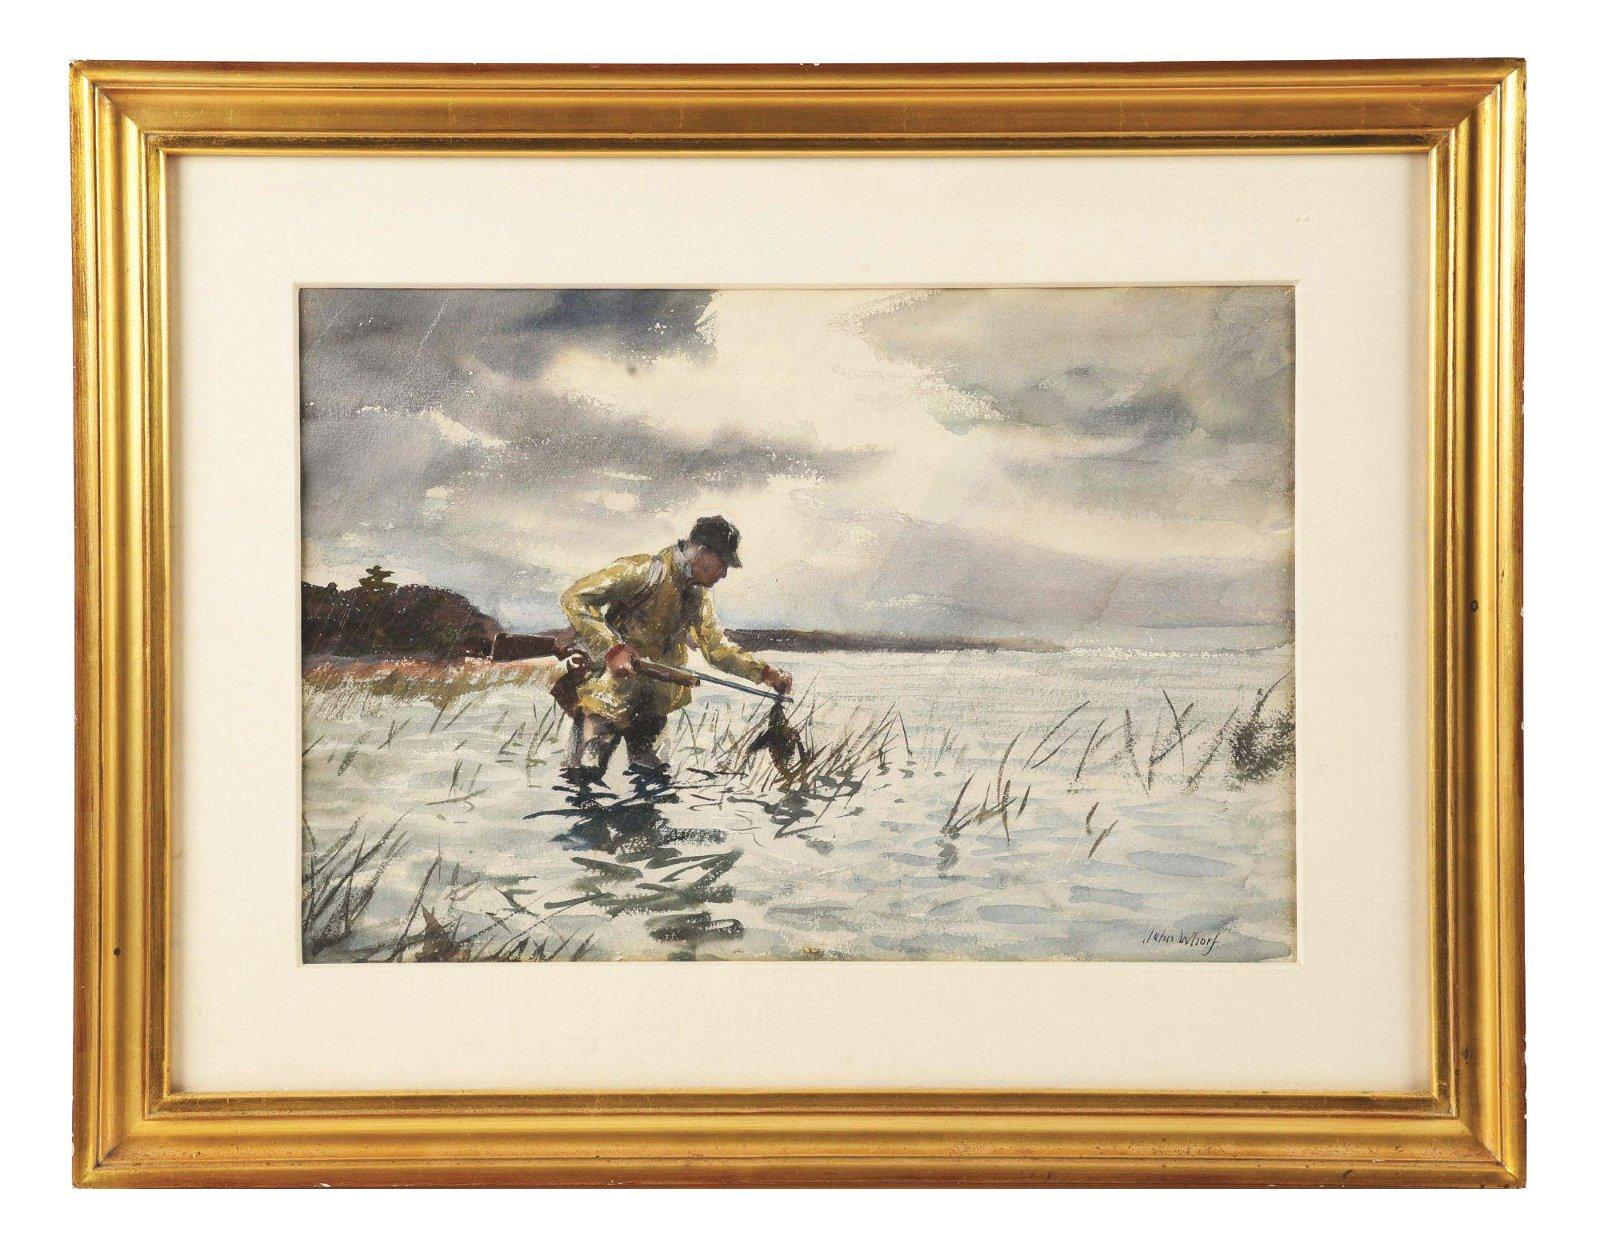 JOHN WHORF (AMERICAN, 1903 - 1959) DUCK HUNTING.